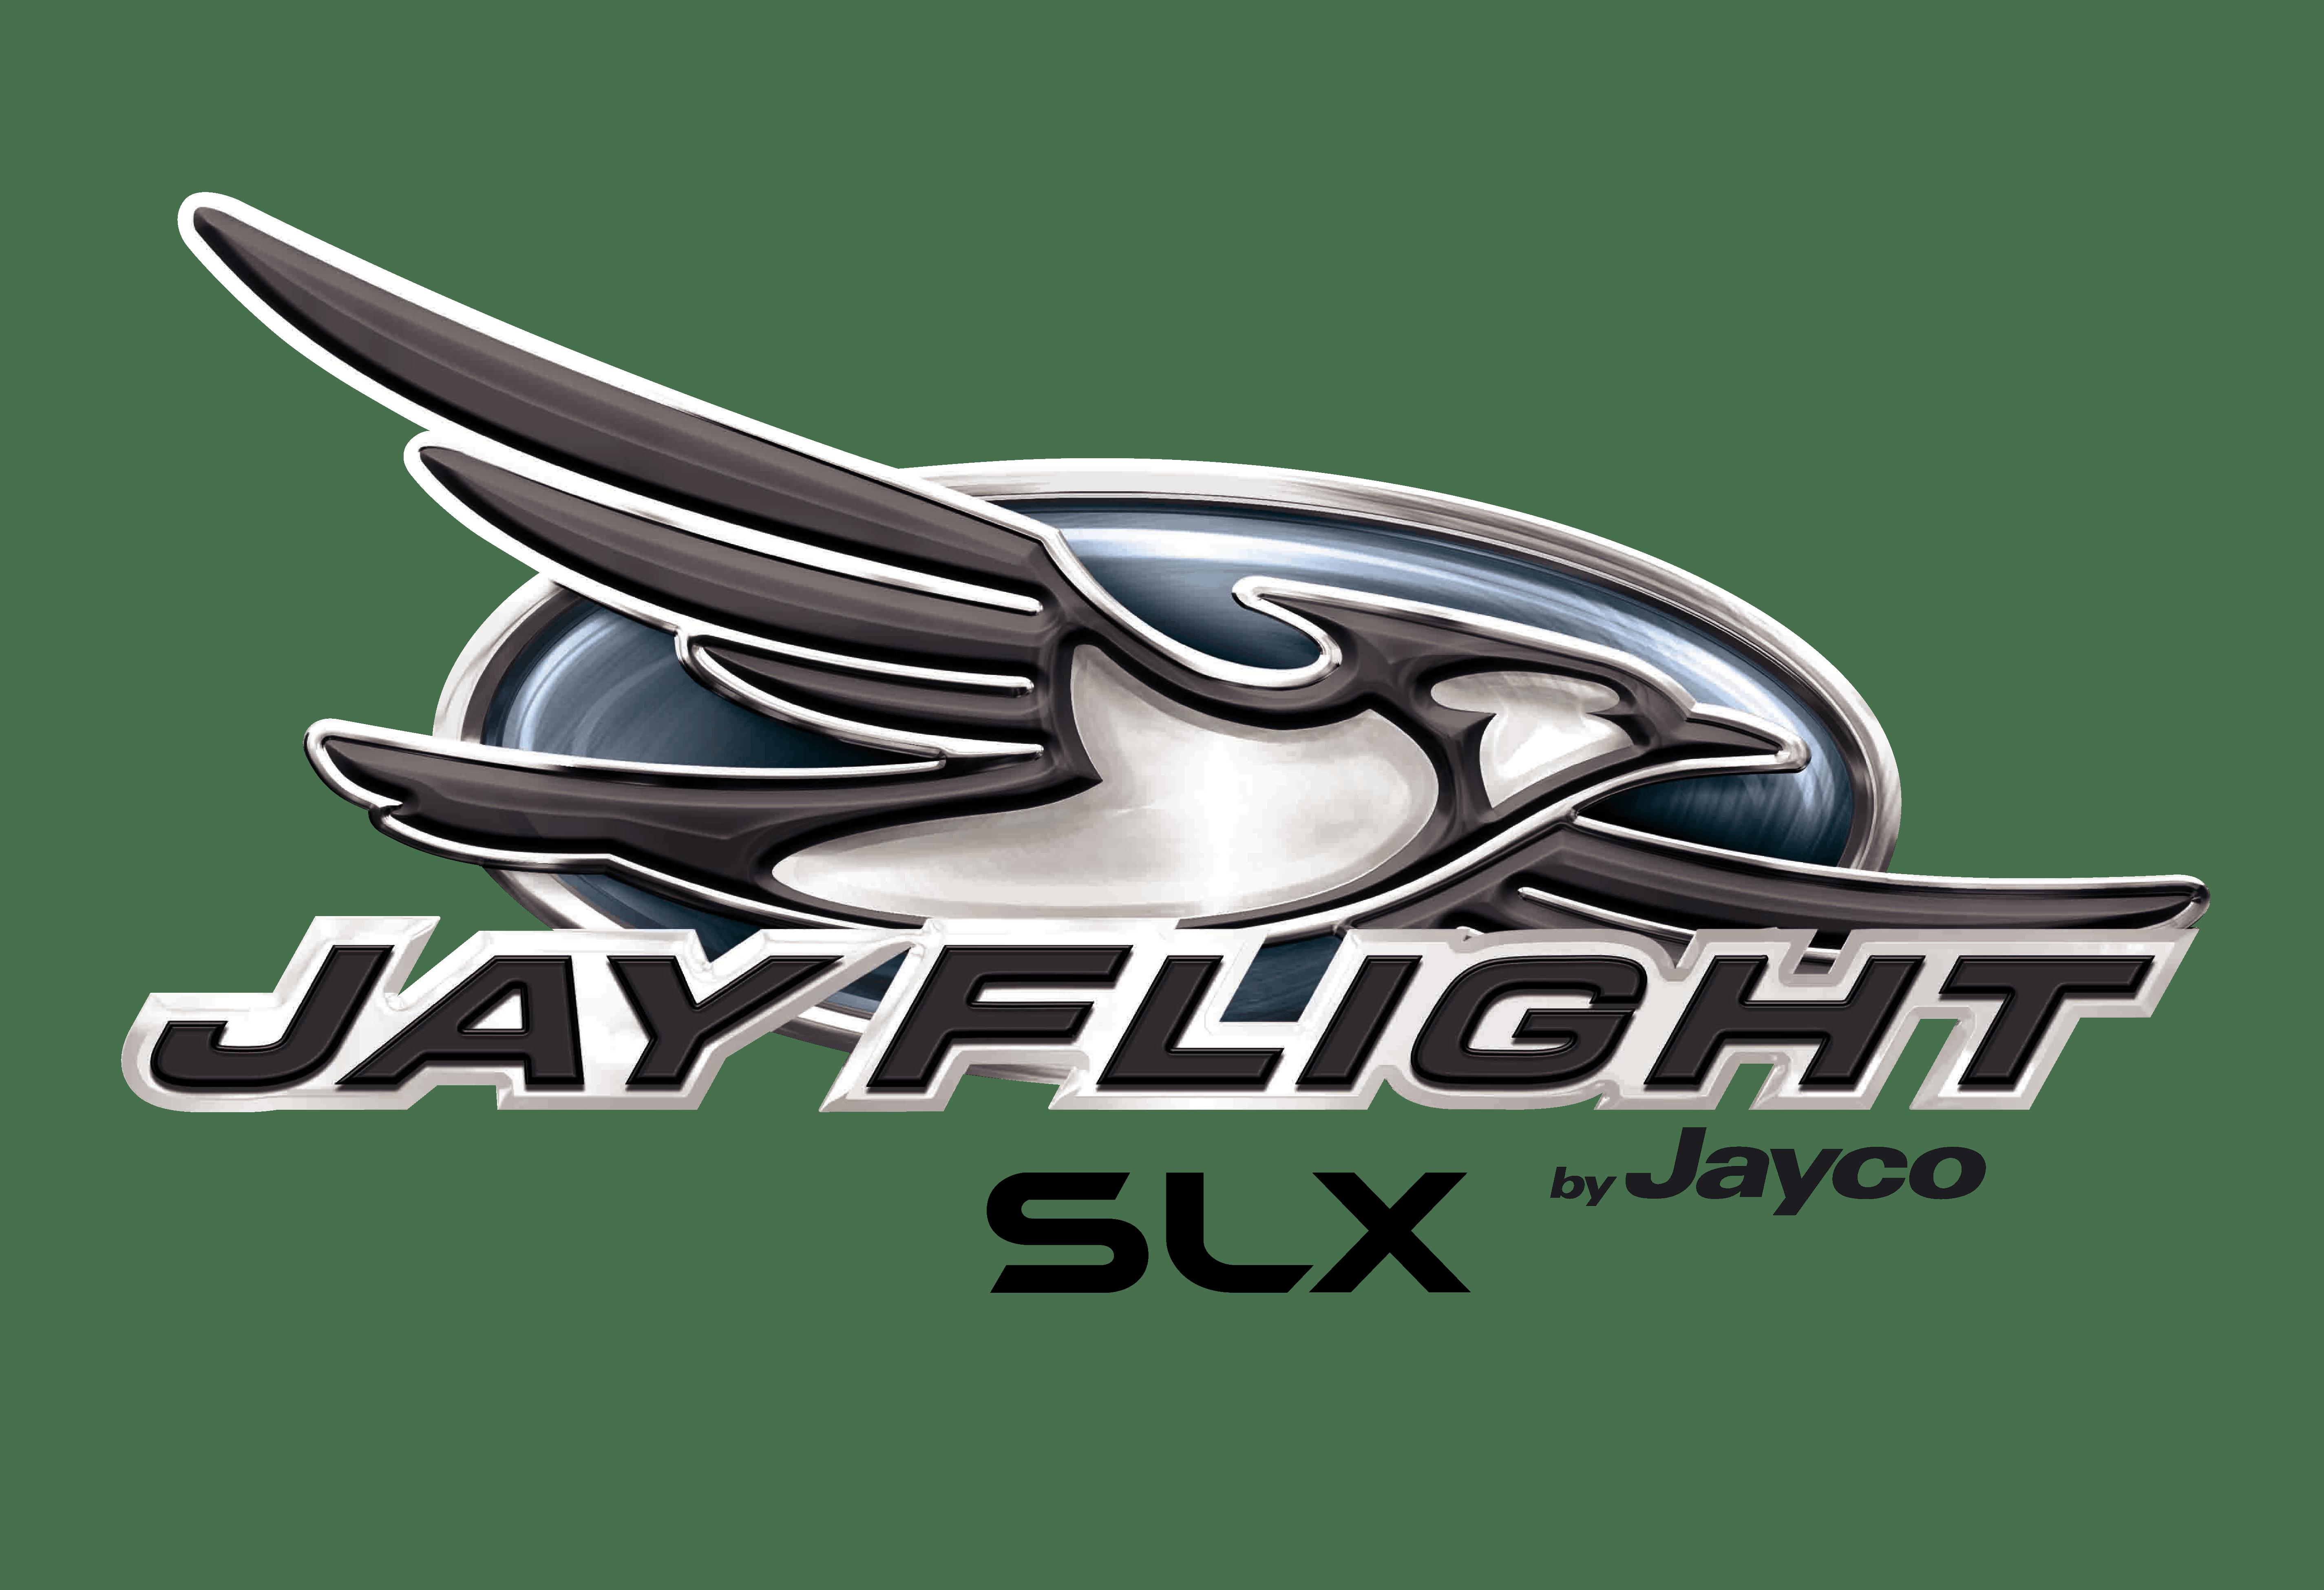 Jay Flight SLX